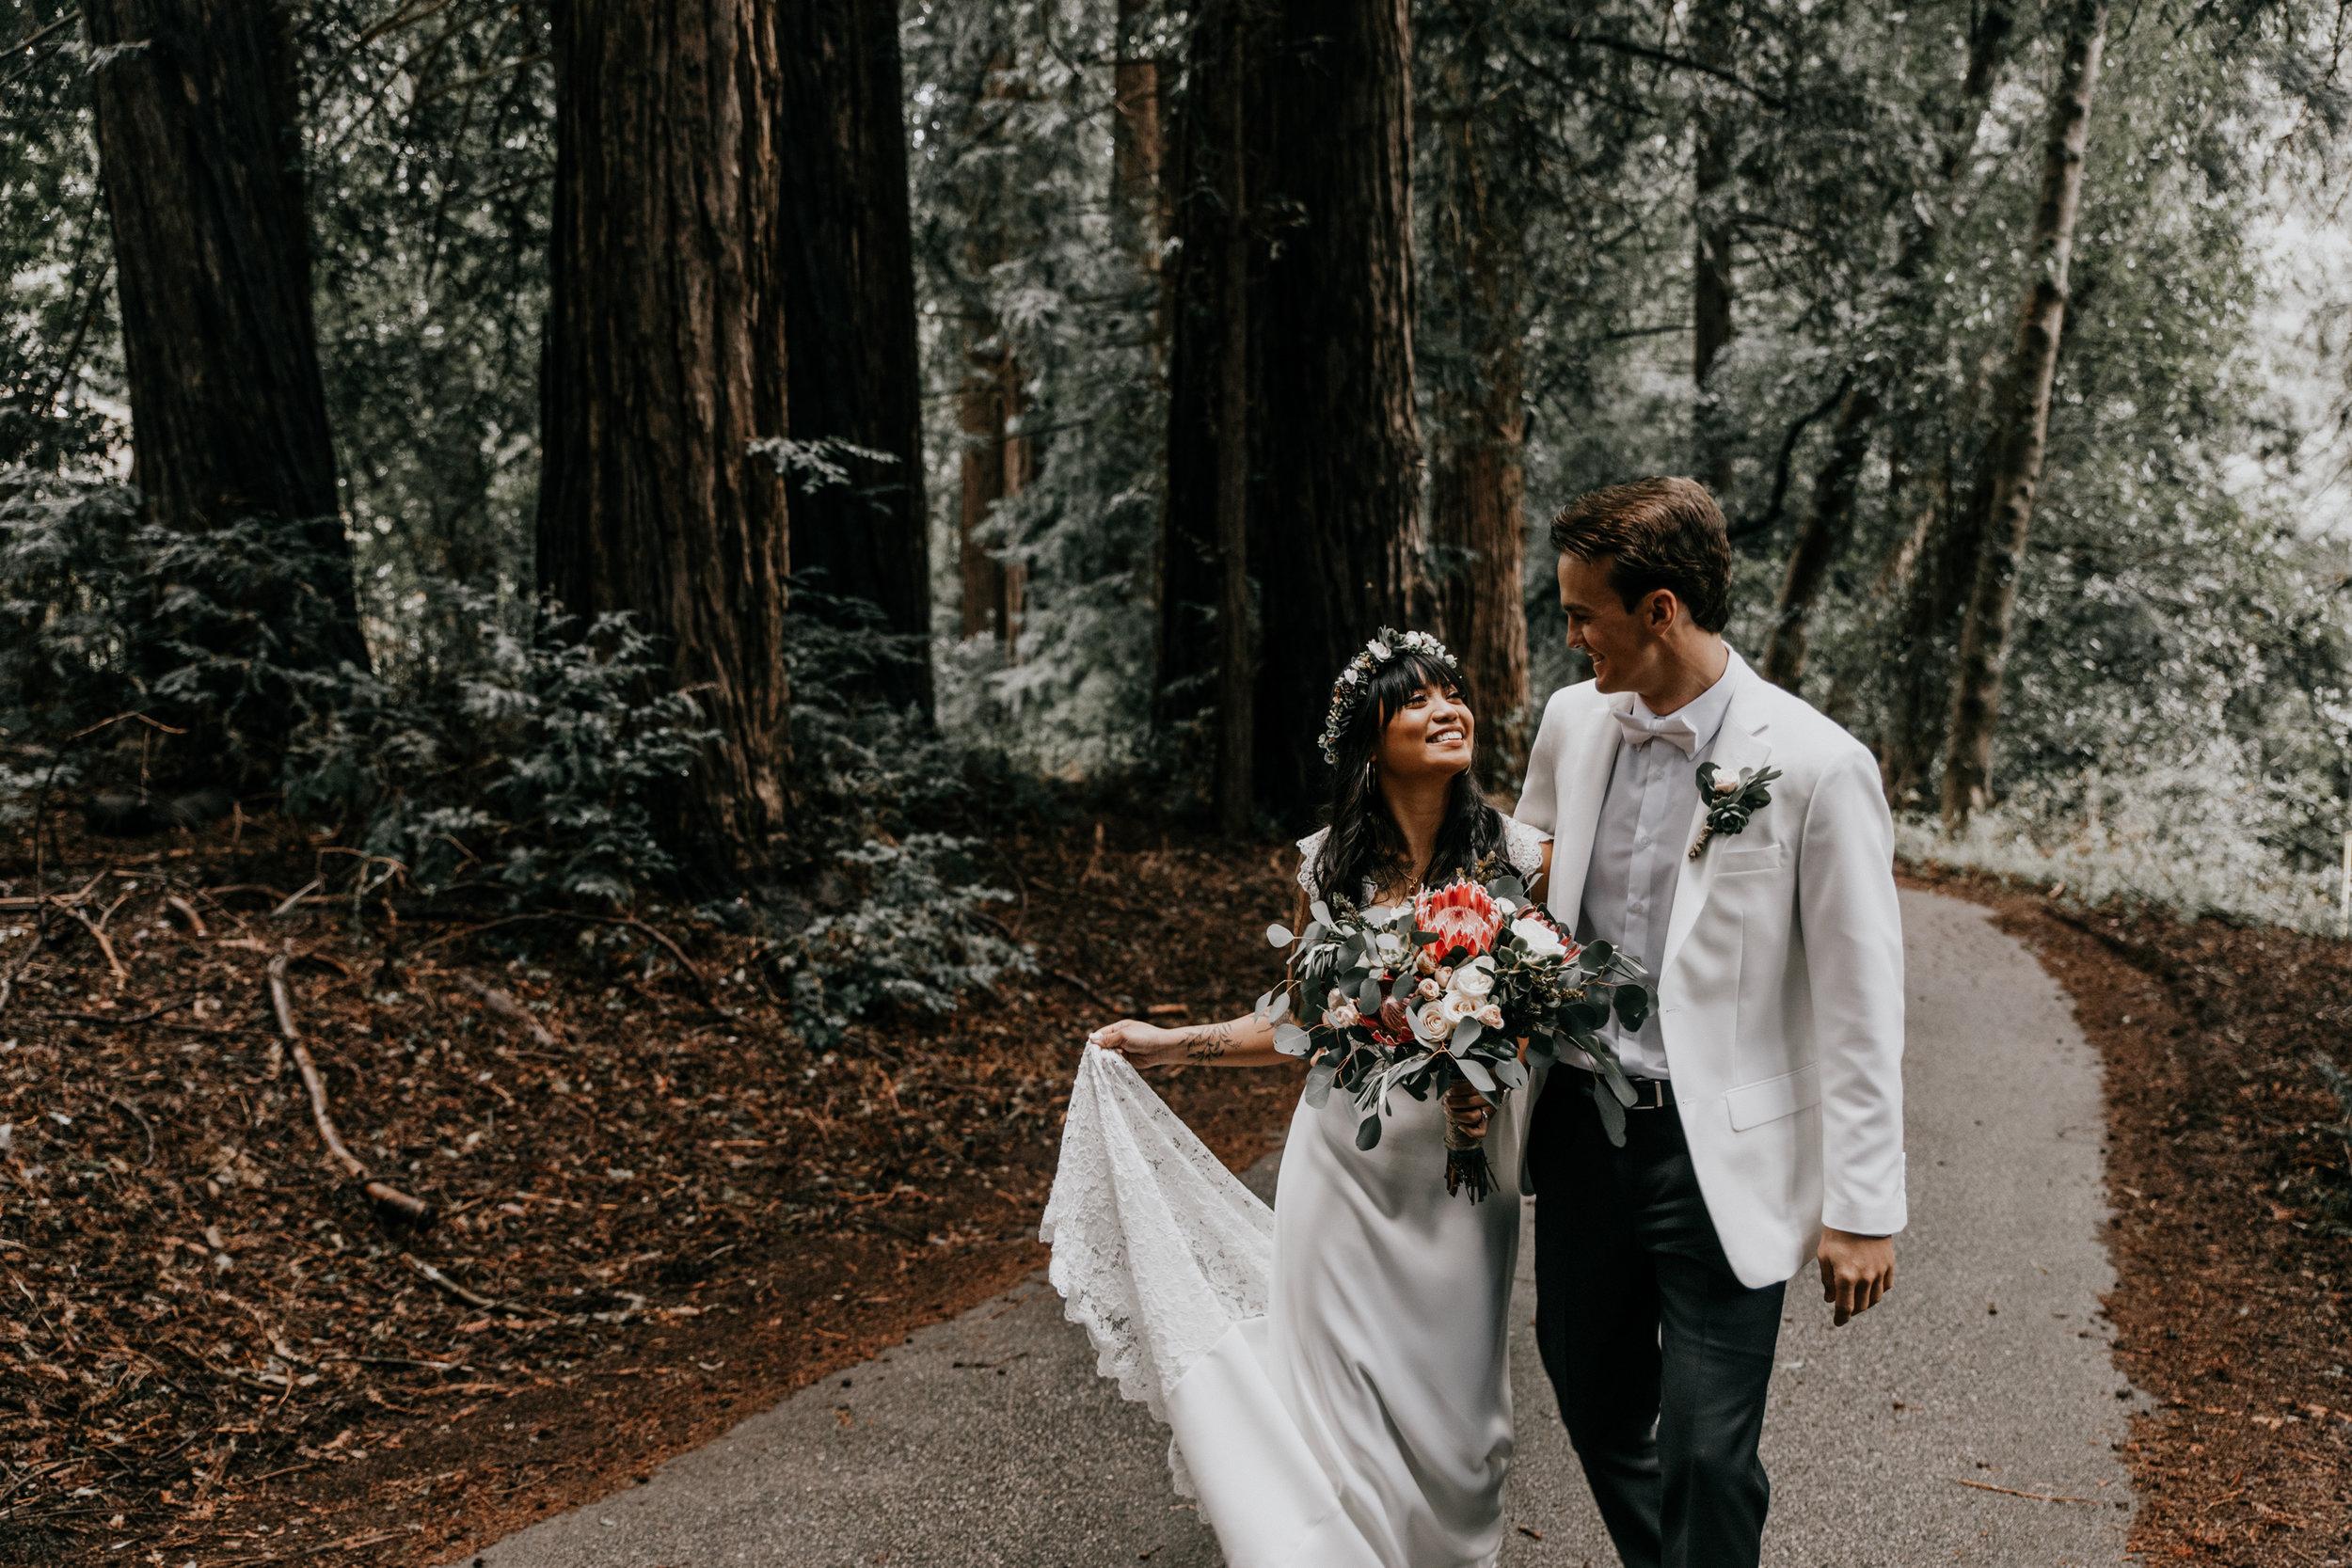 WeddingphotographerinCalifornia.jpg